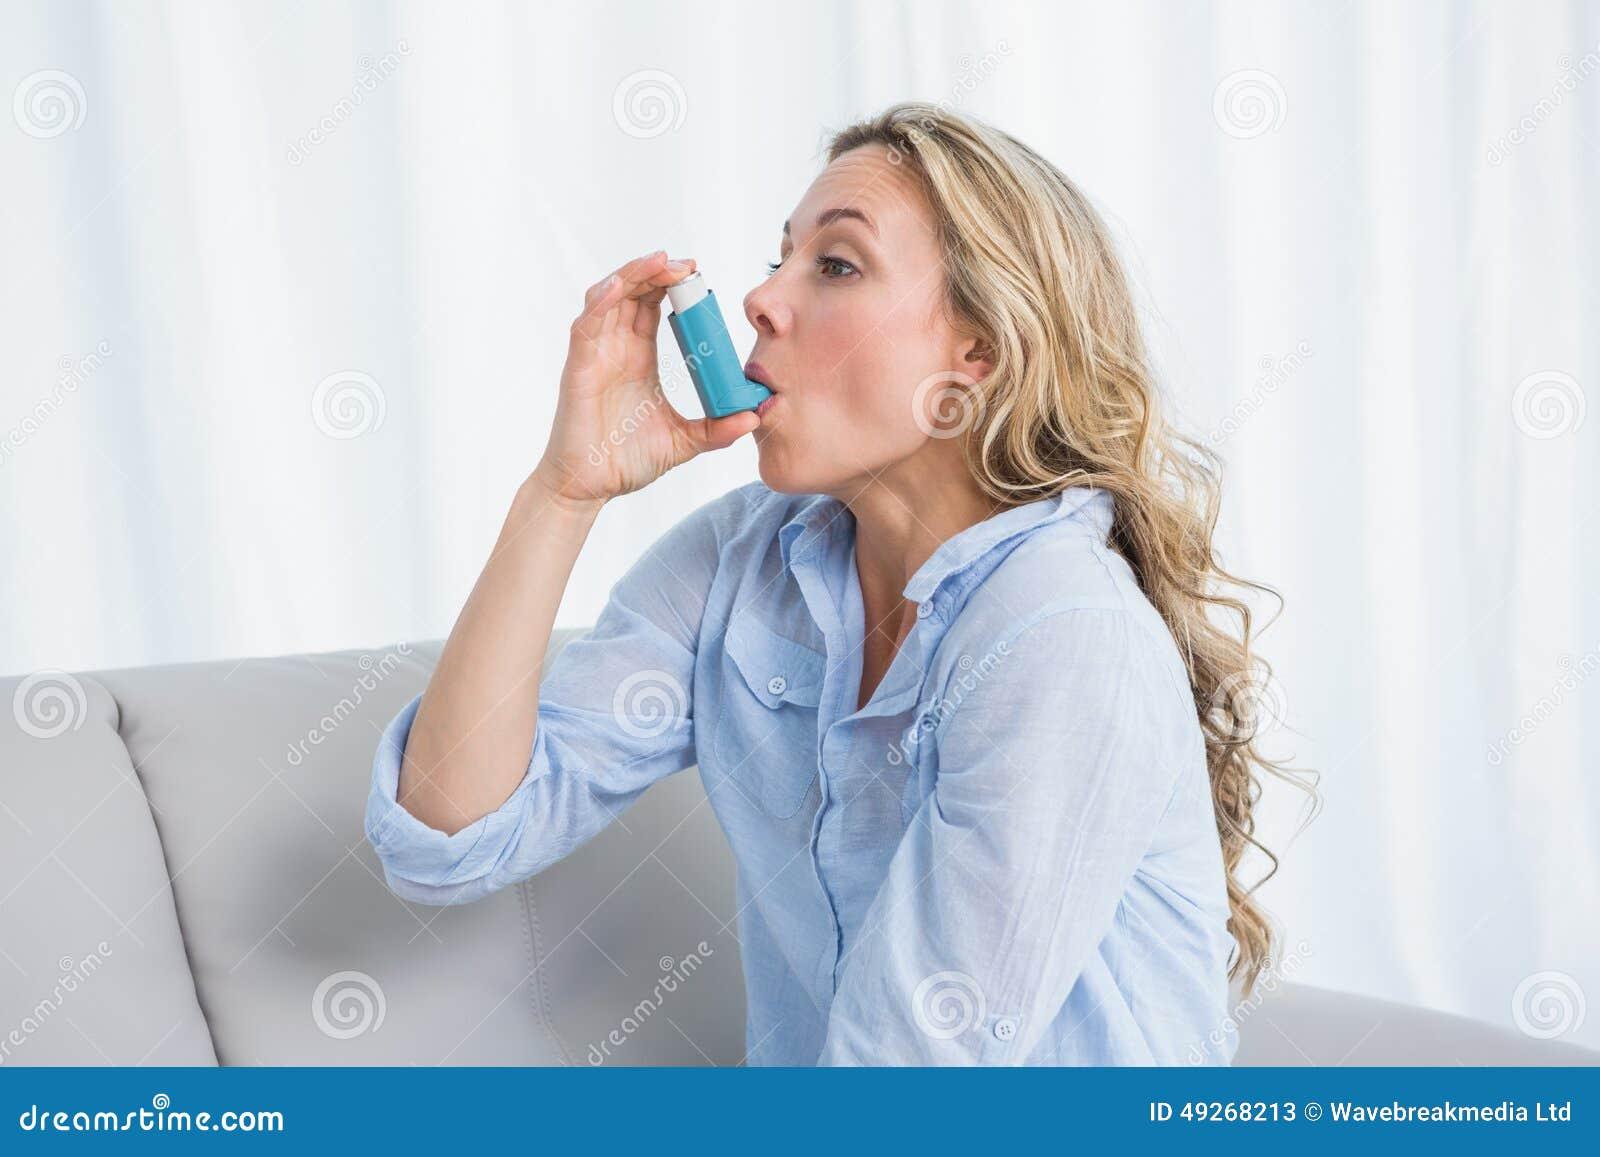 Blonde using her asthma inhaler on couch